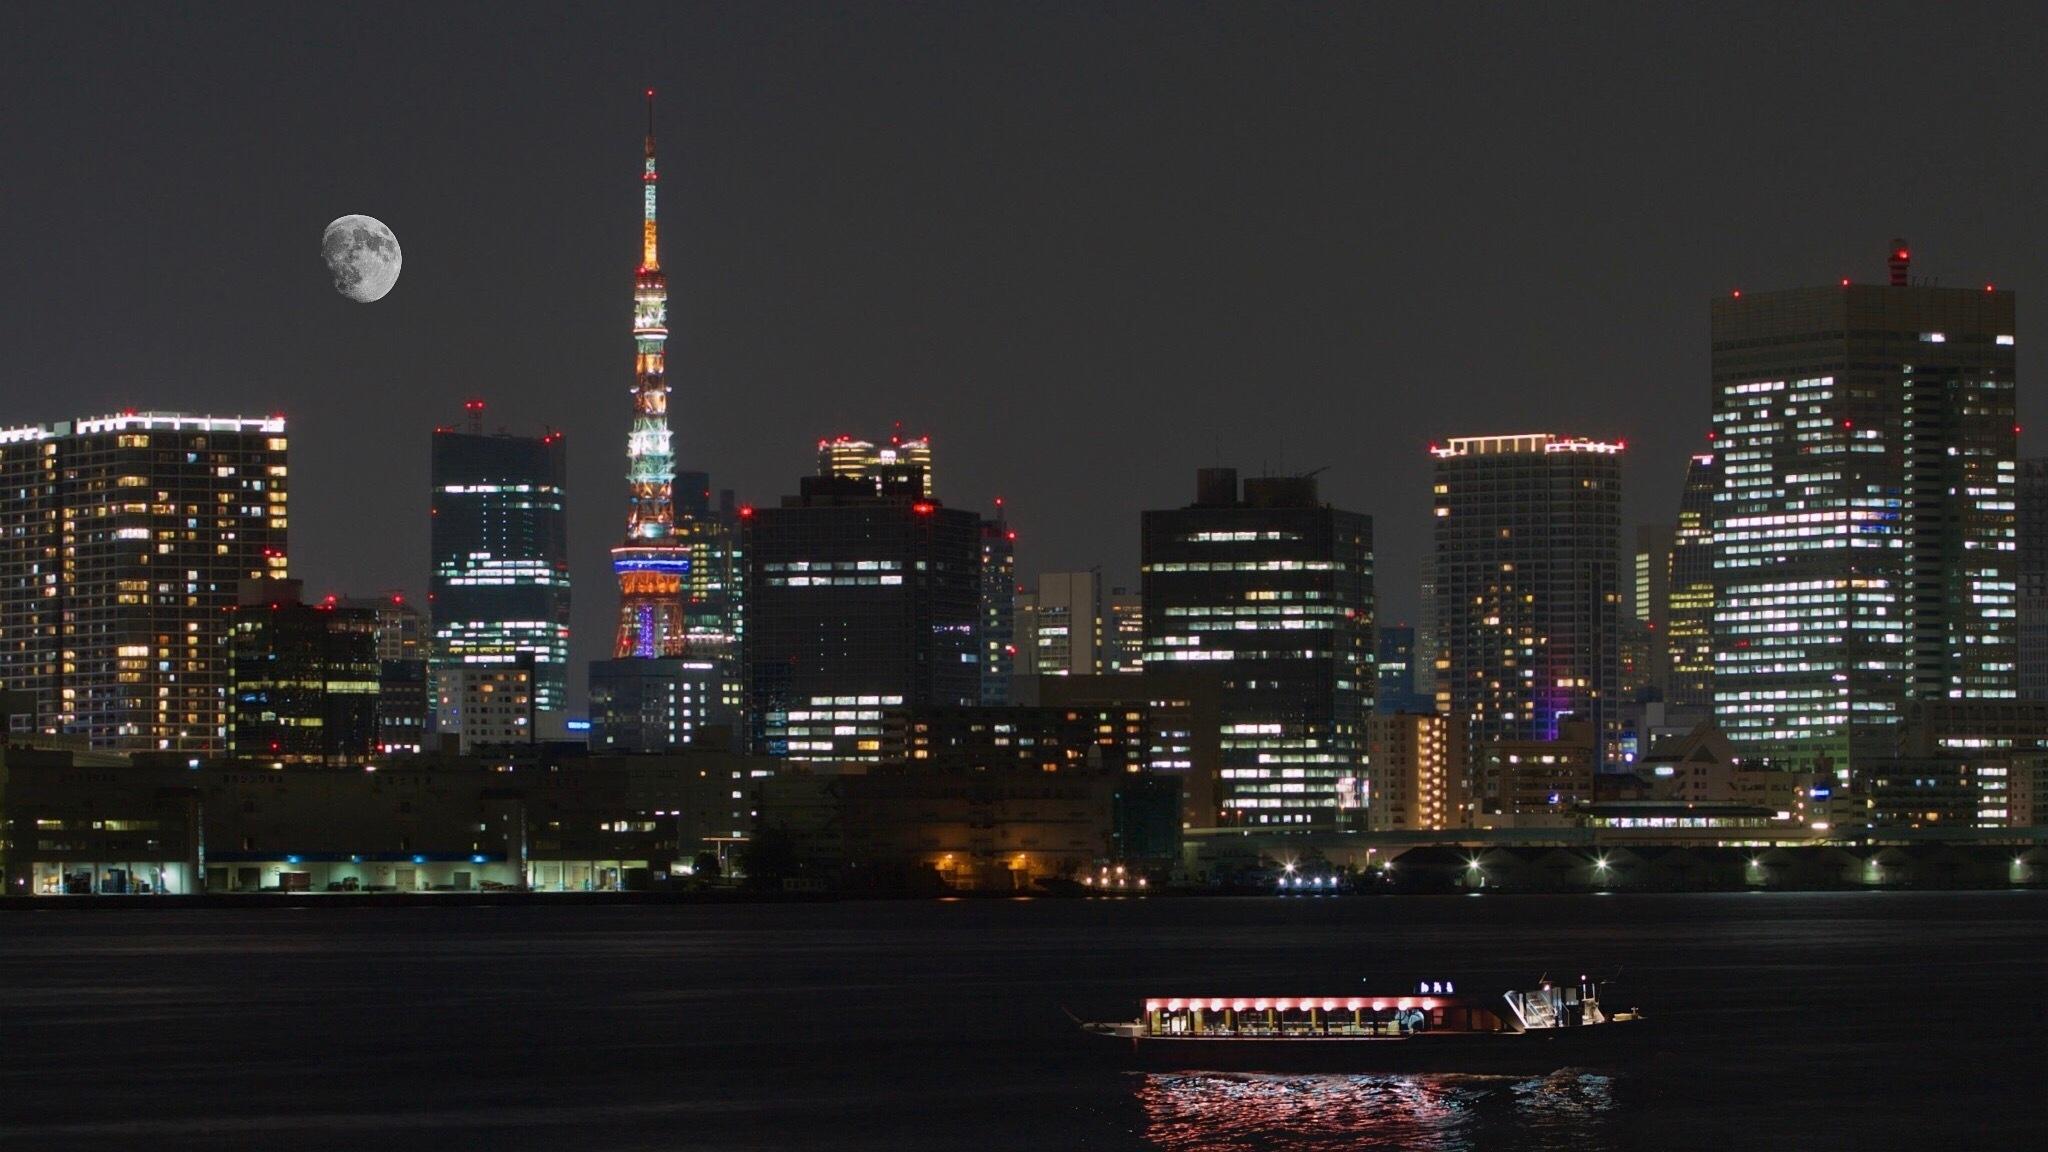 東京 TOWER by Jp Punzalan